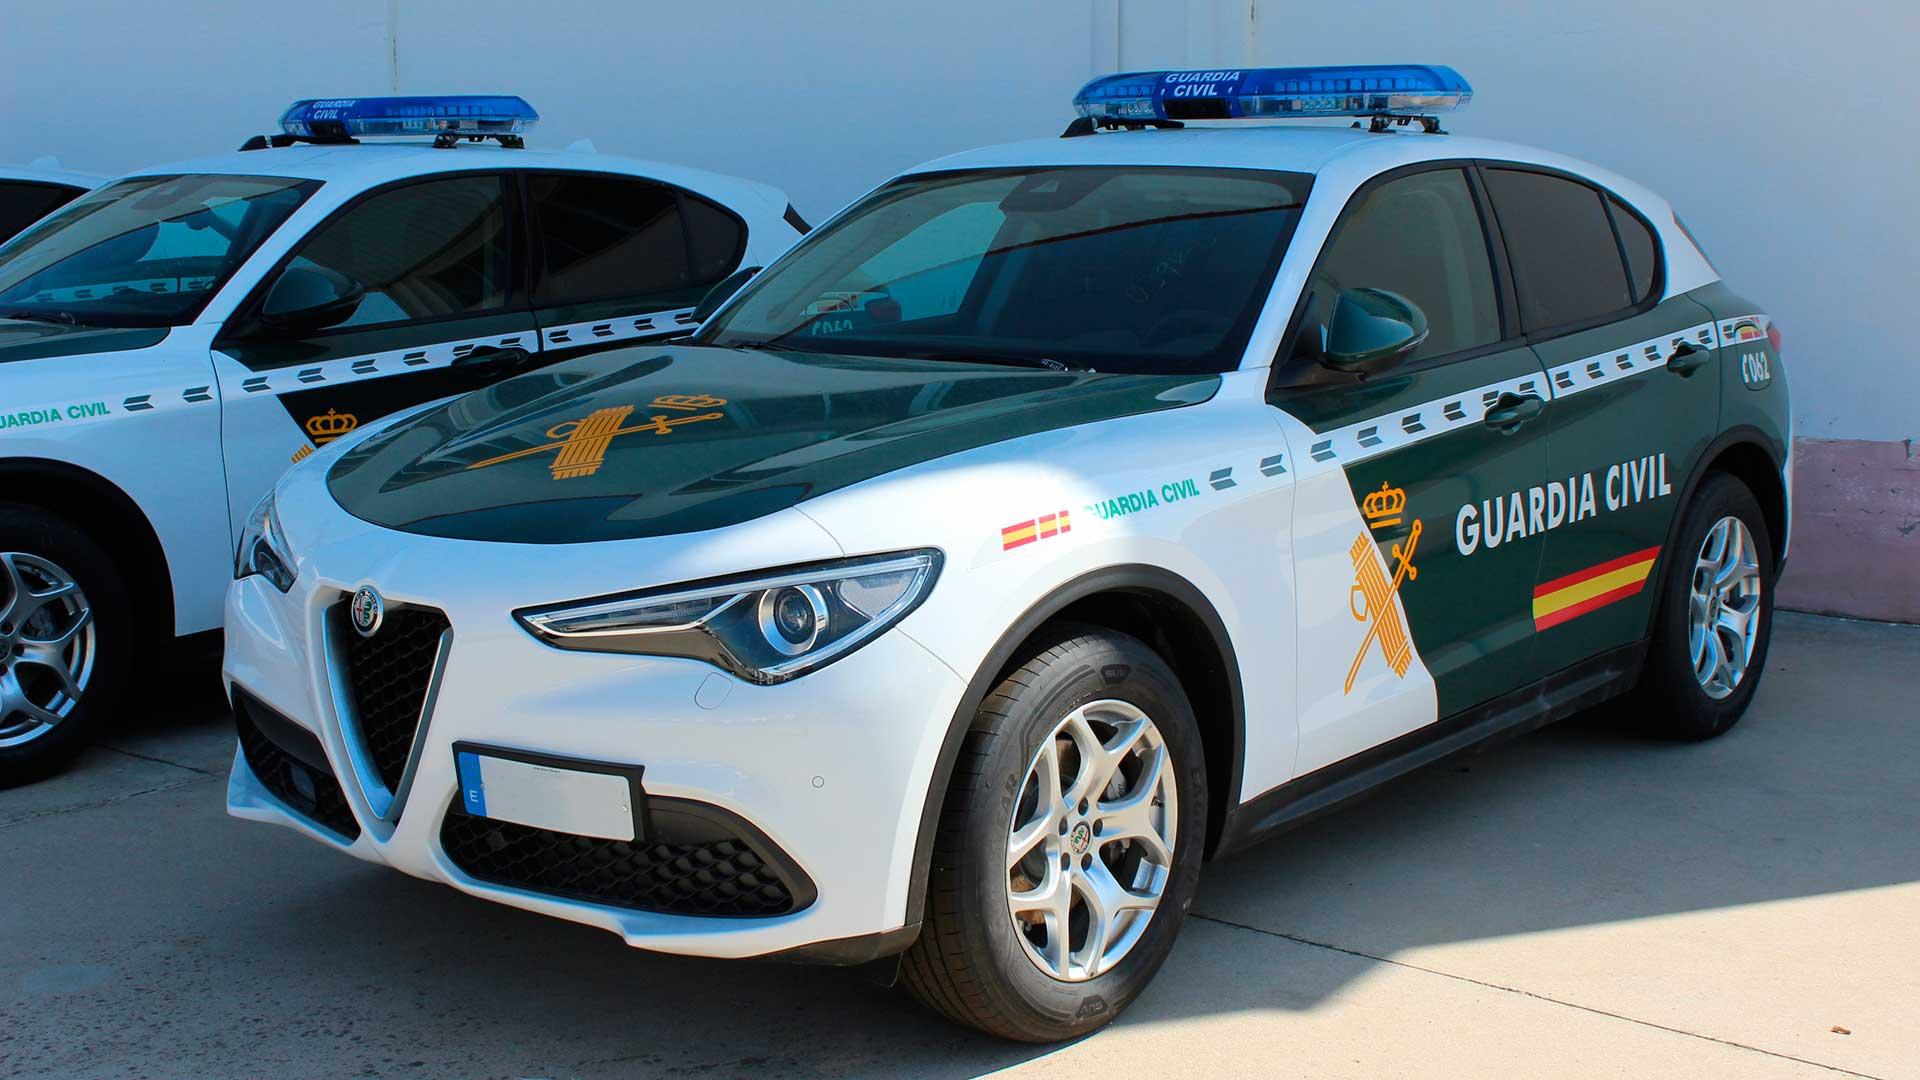 La Guardia Civil estrena coche: 62 Alfa Romeo Stelvio Q4 2021 de 200 CV